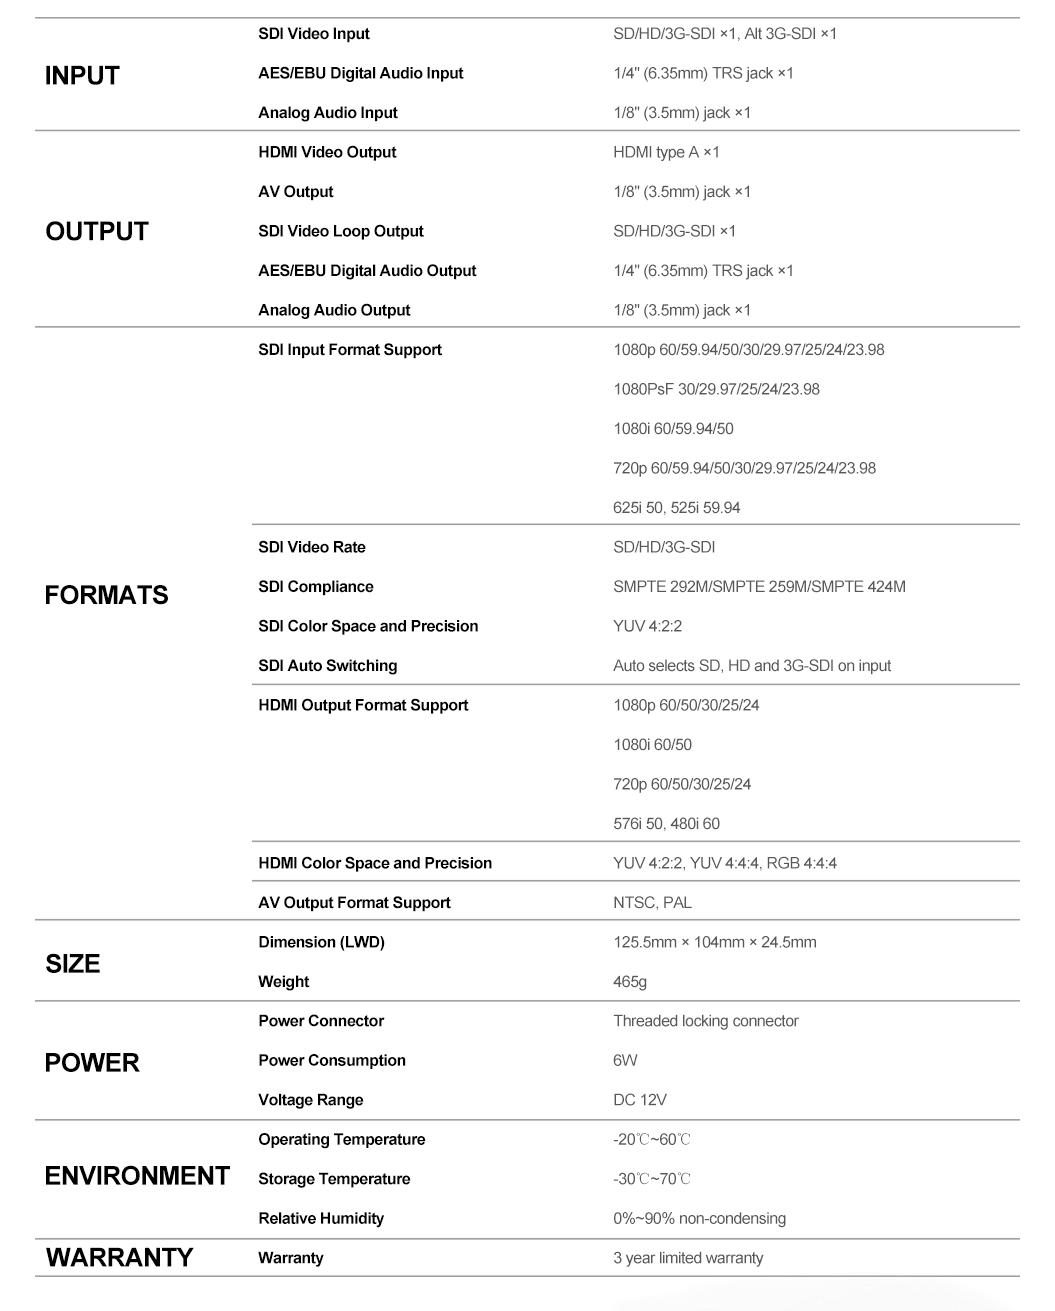 AVMATRIX 3G-SDI to HMDI/AV